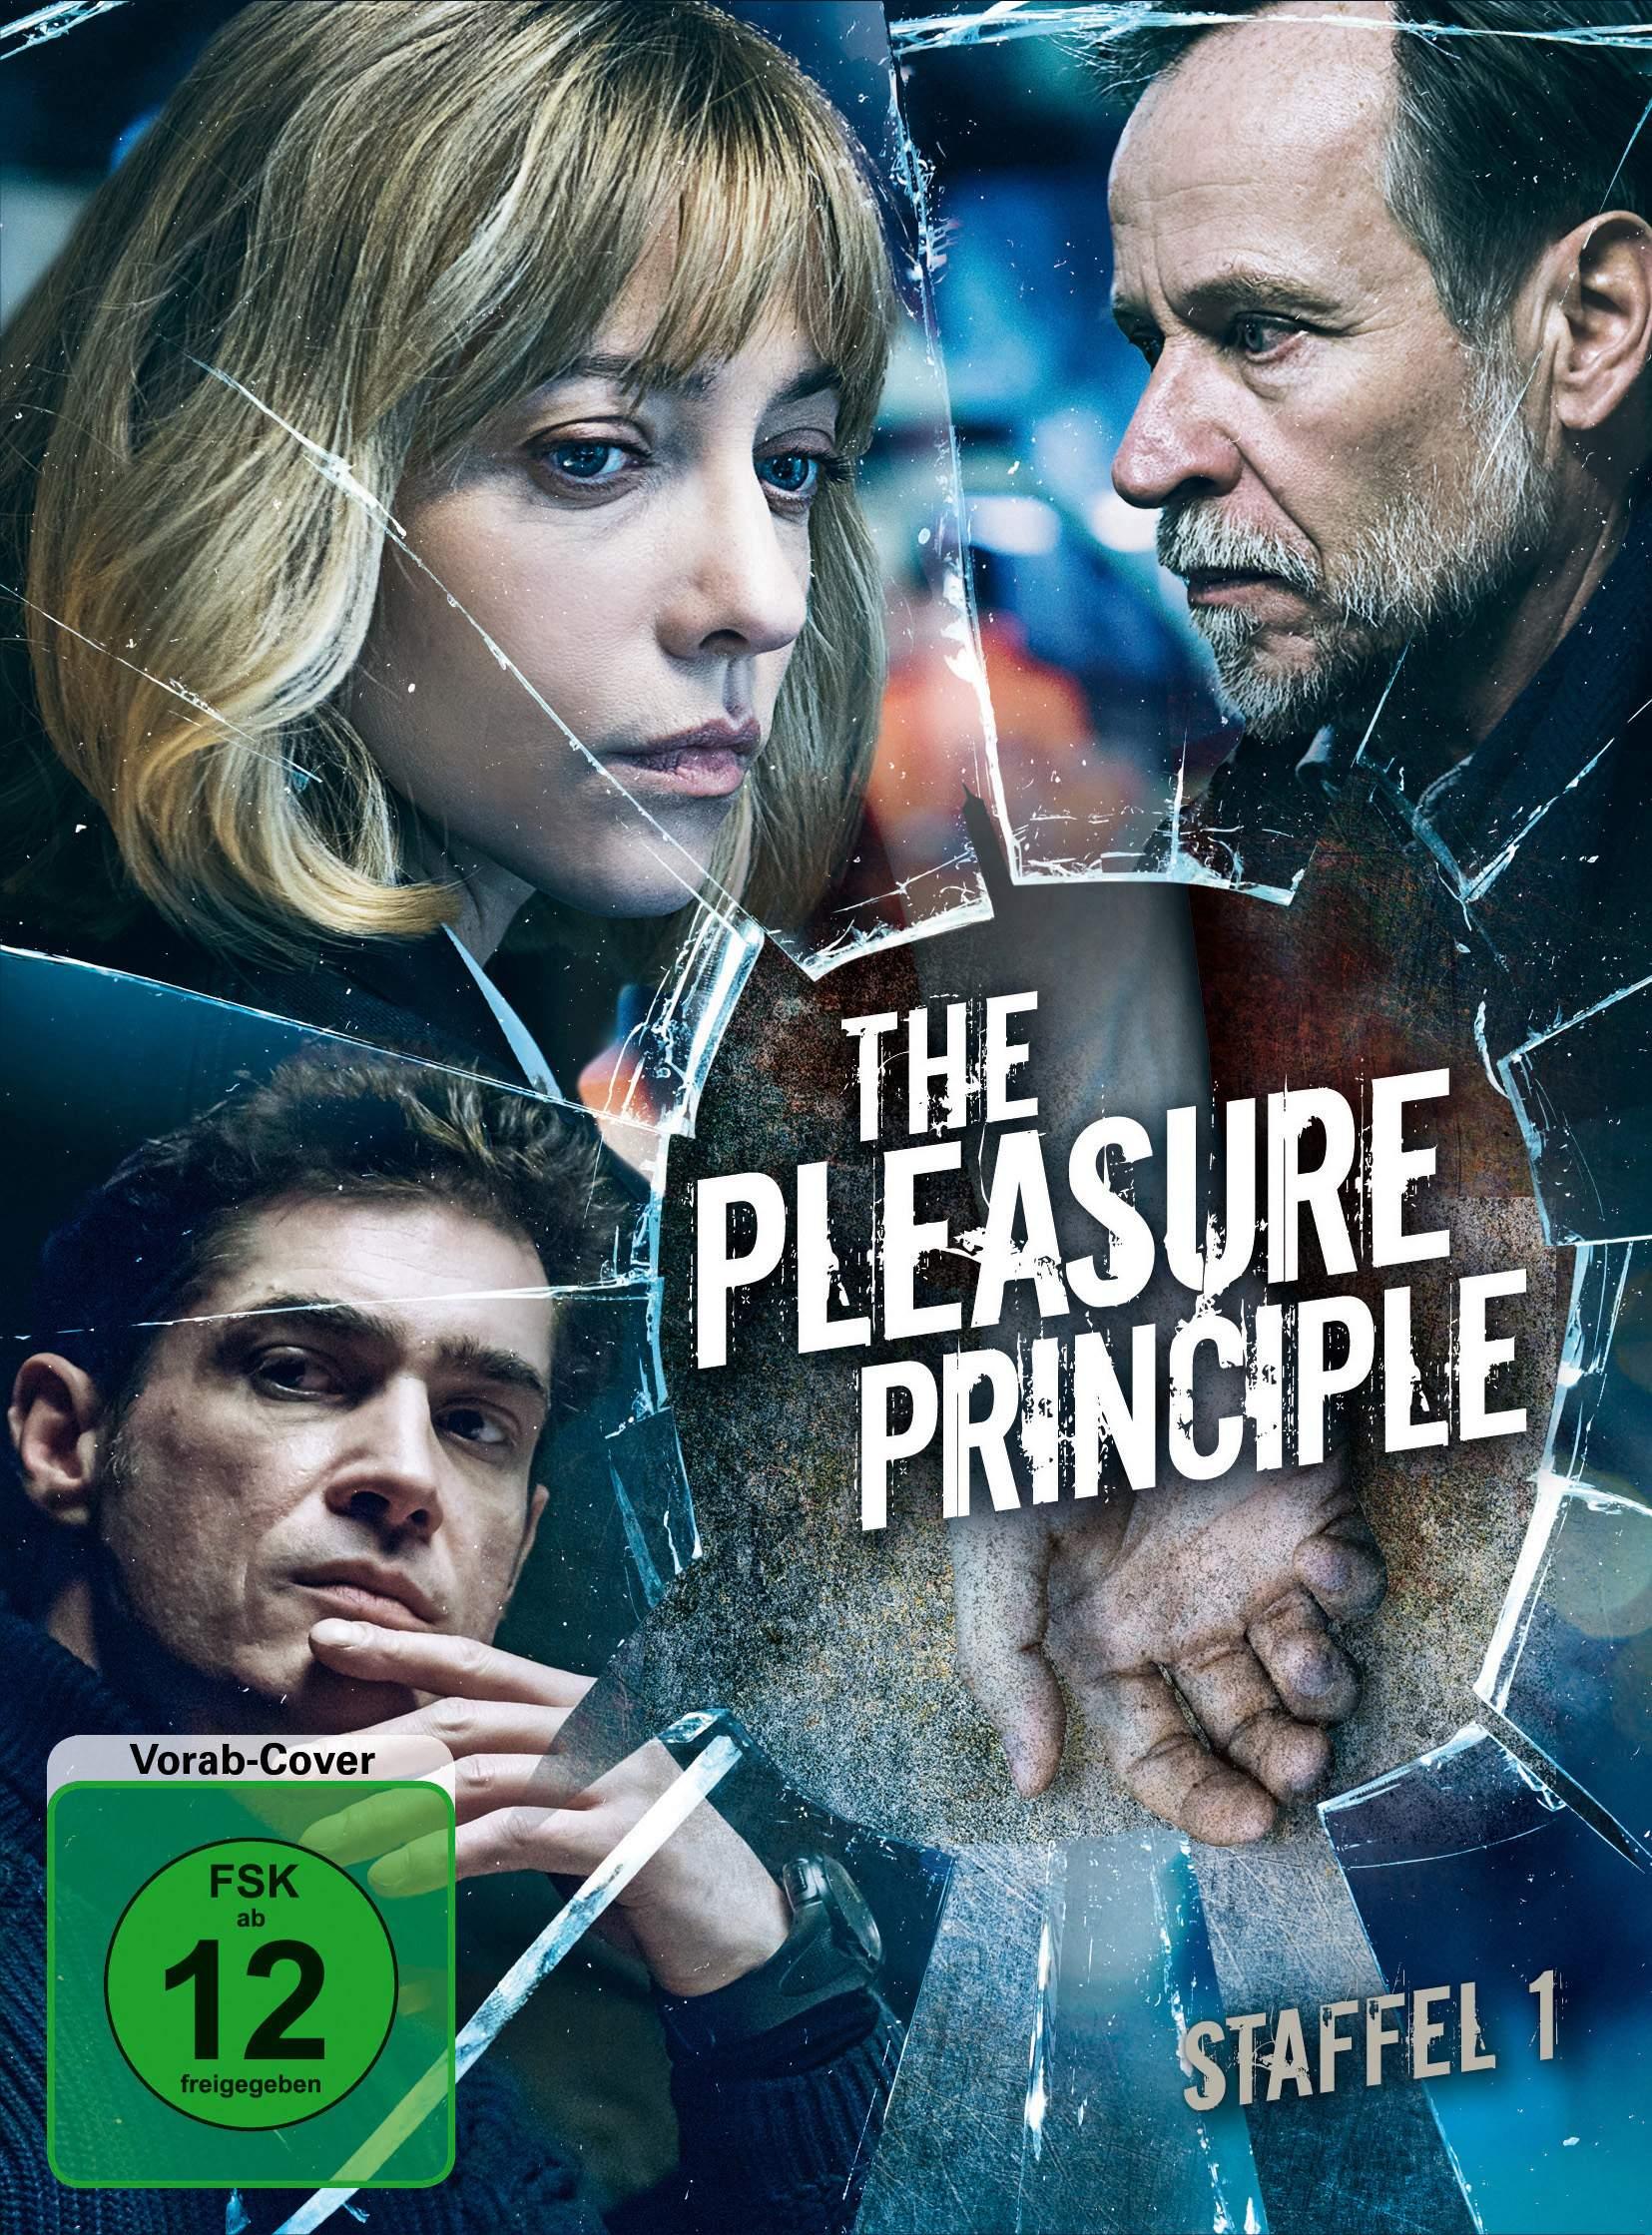 Pleasure-Principle_S1-DVD-Front-FSK12-Vorab-02